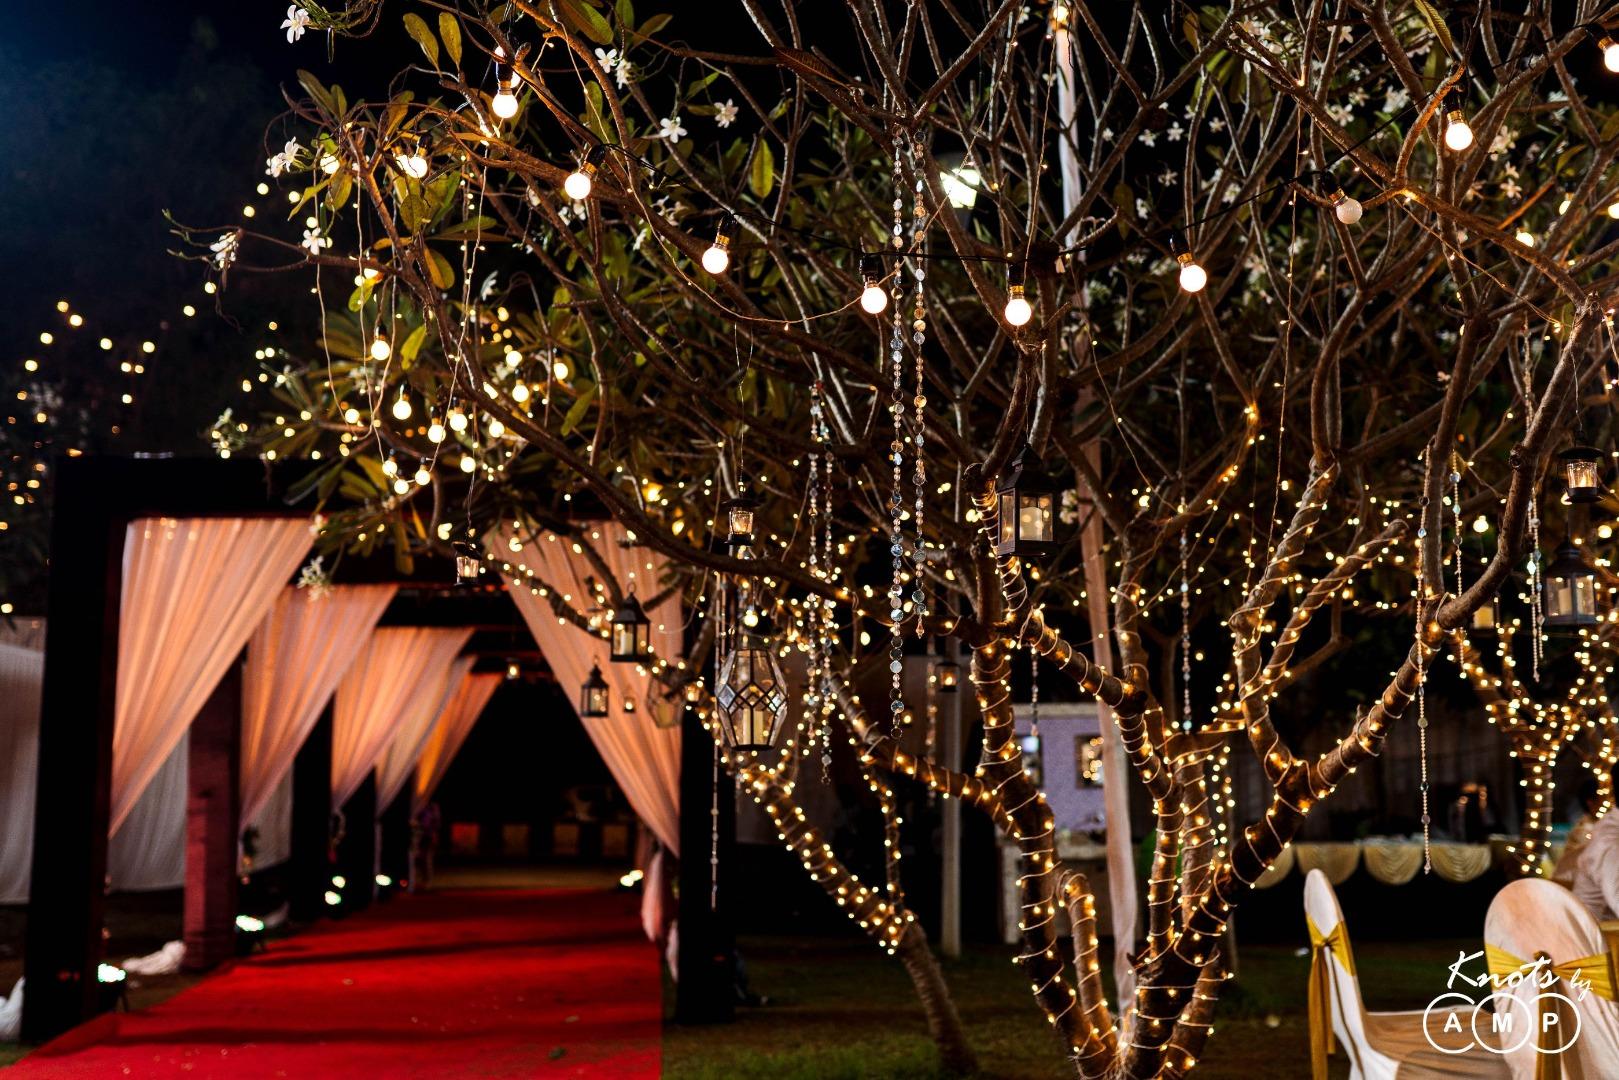 Fairy Light Decorated Tree and Draped Entrance Decor